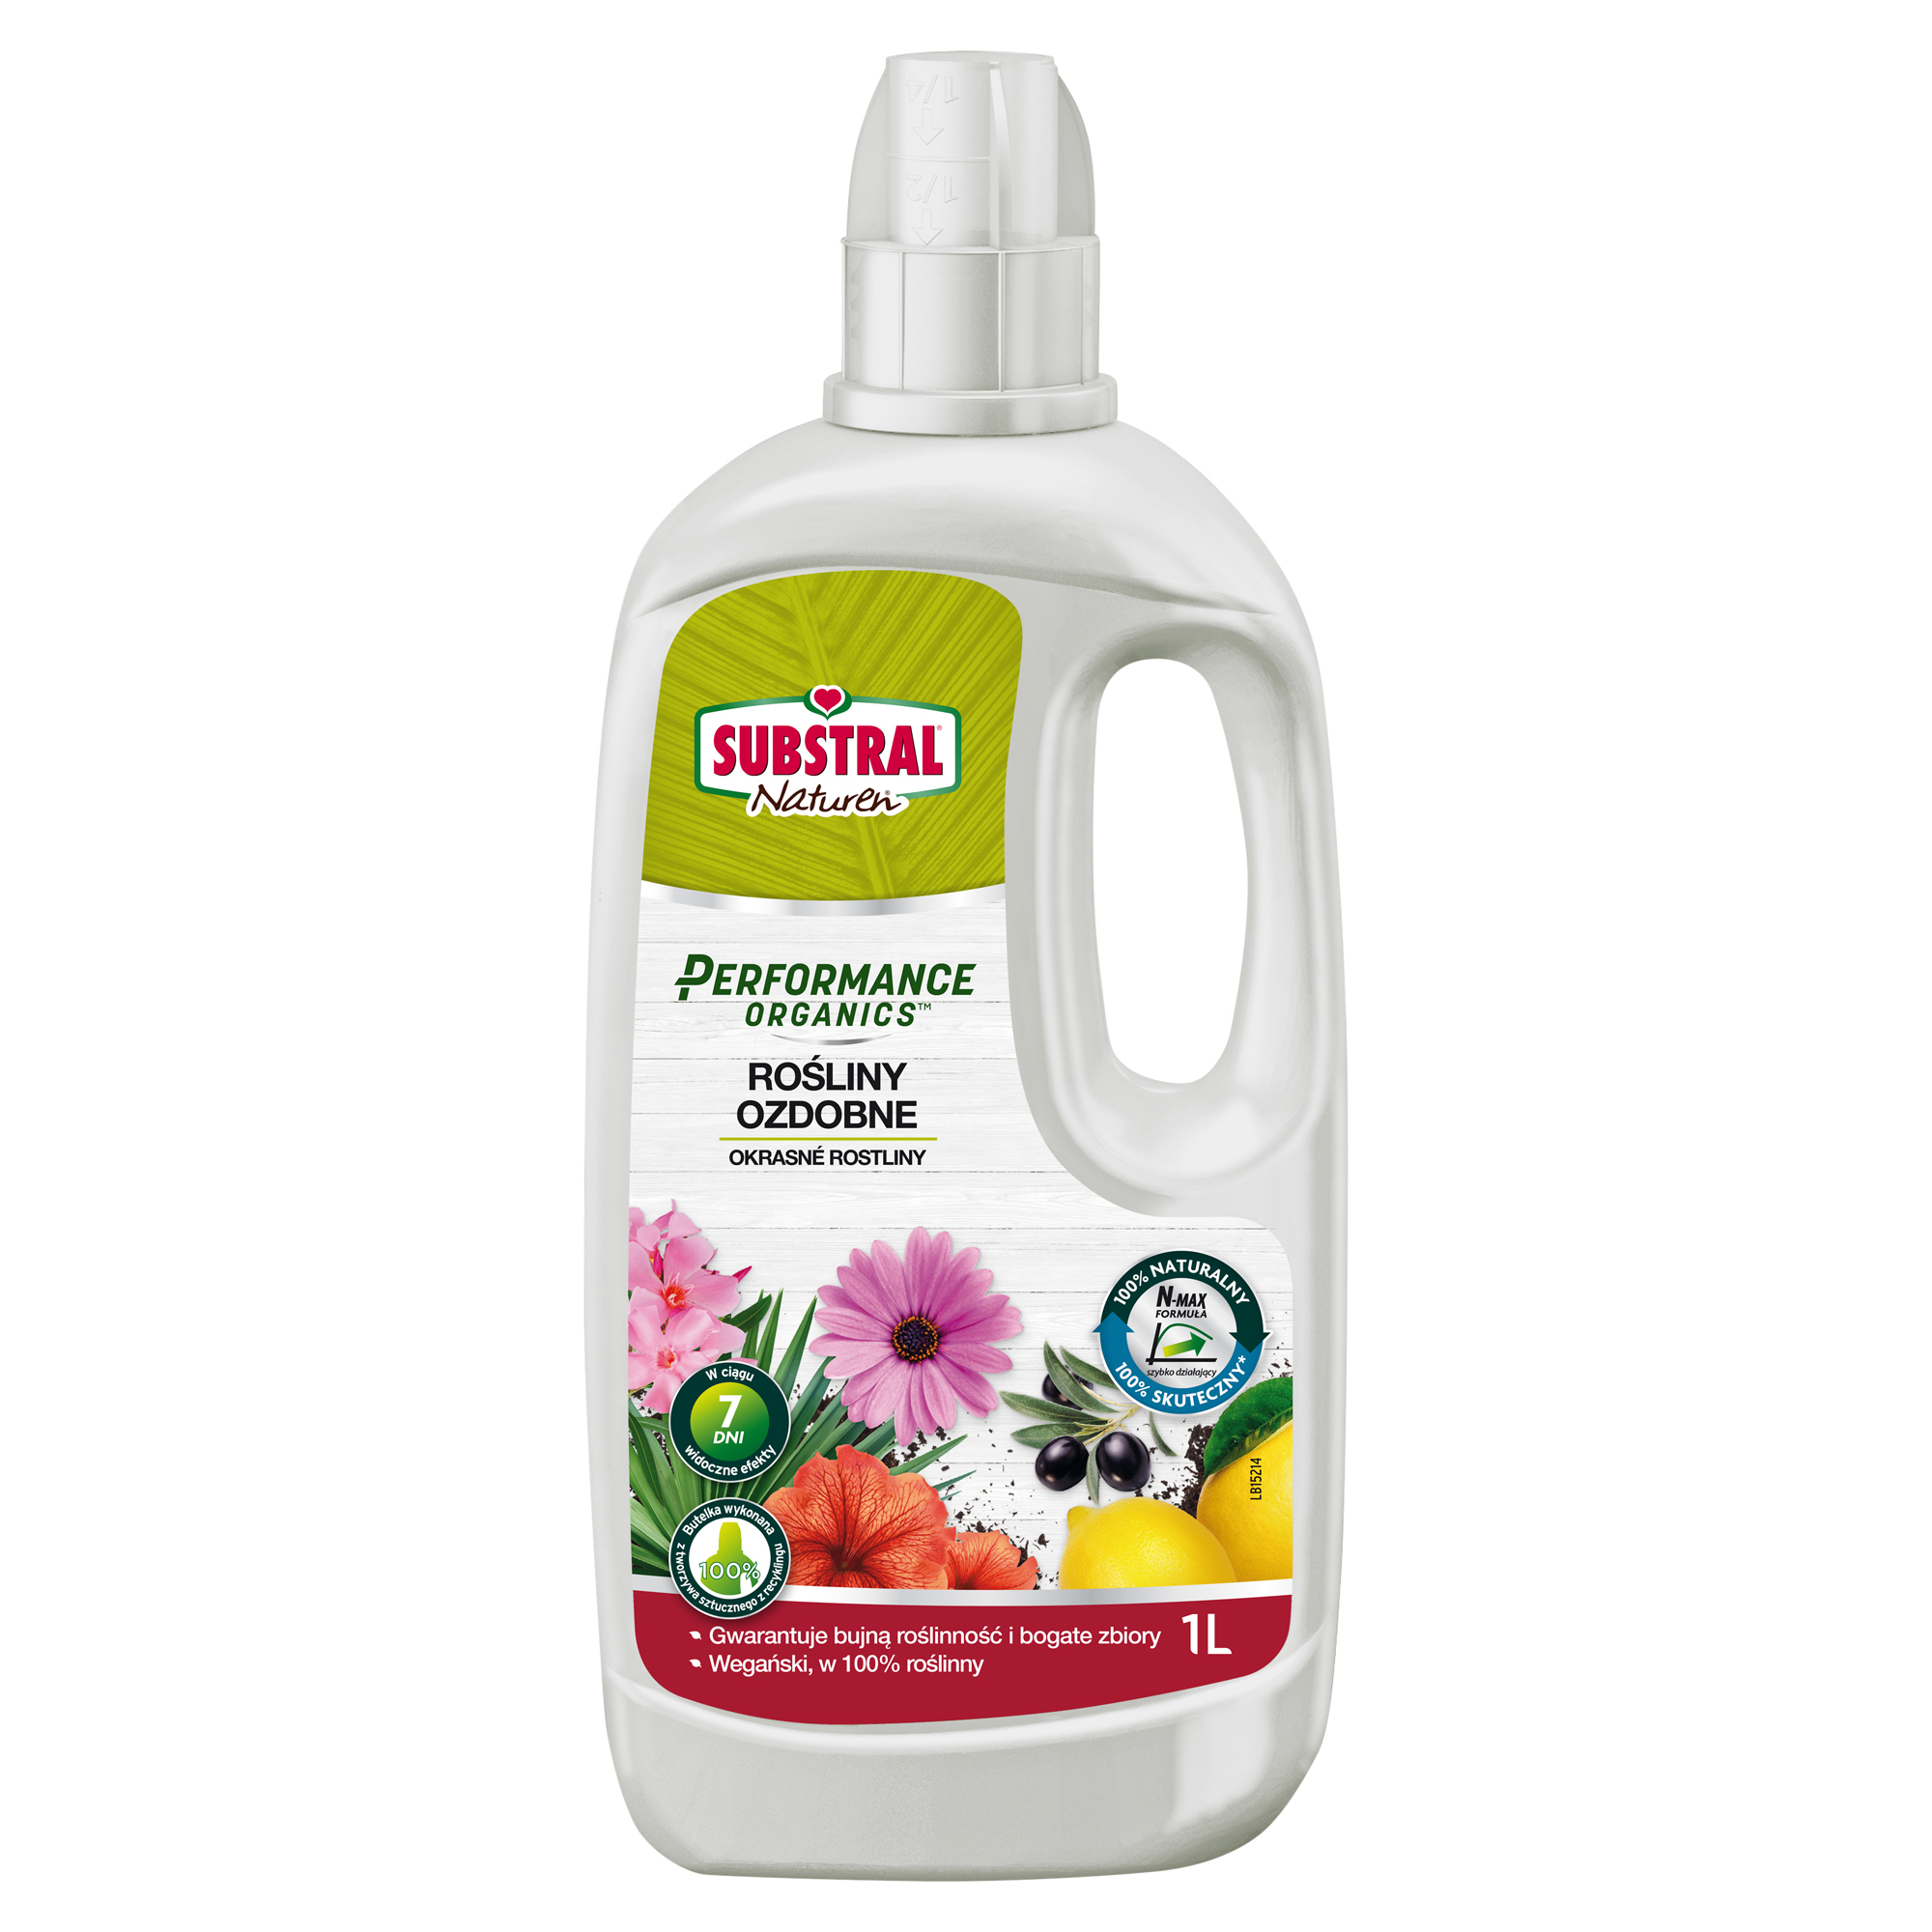 SUBSTRAL Performance Organics Hnojivo tekuté 1 l - zahrada SUBSTRAL 1713101OR